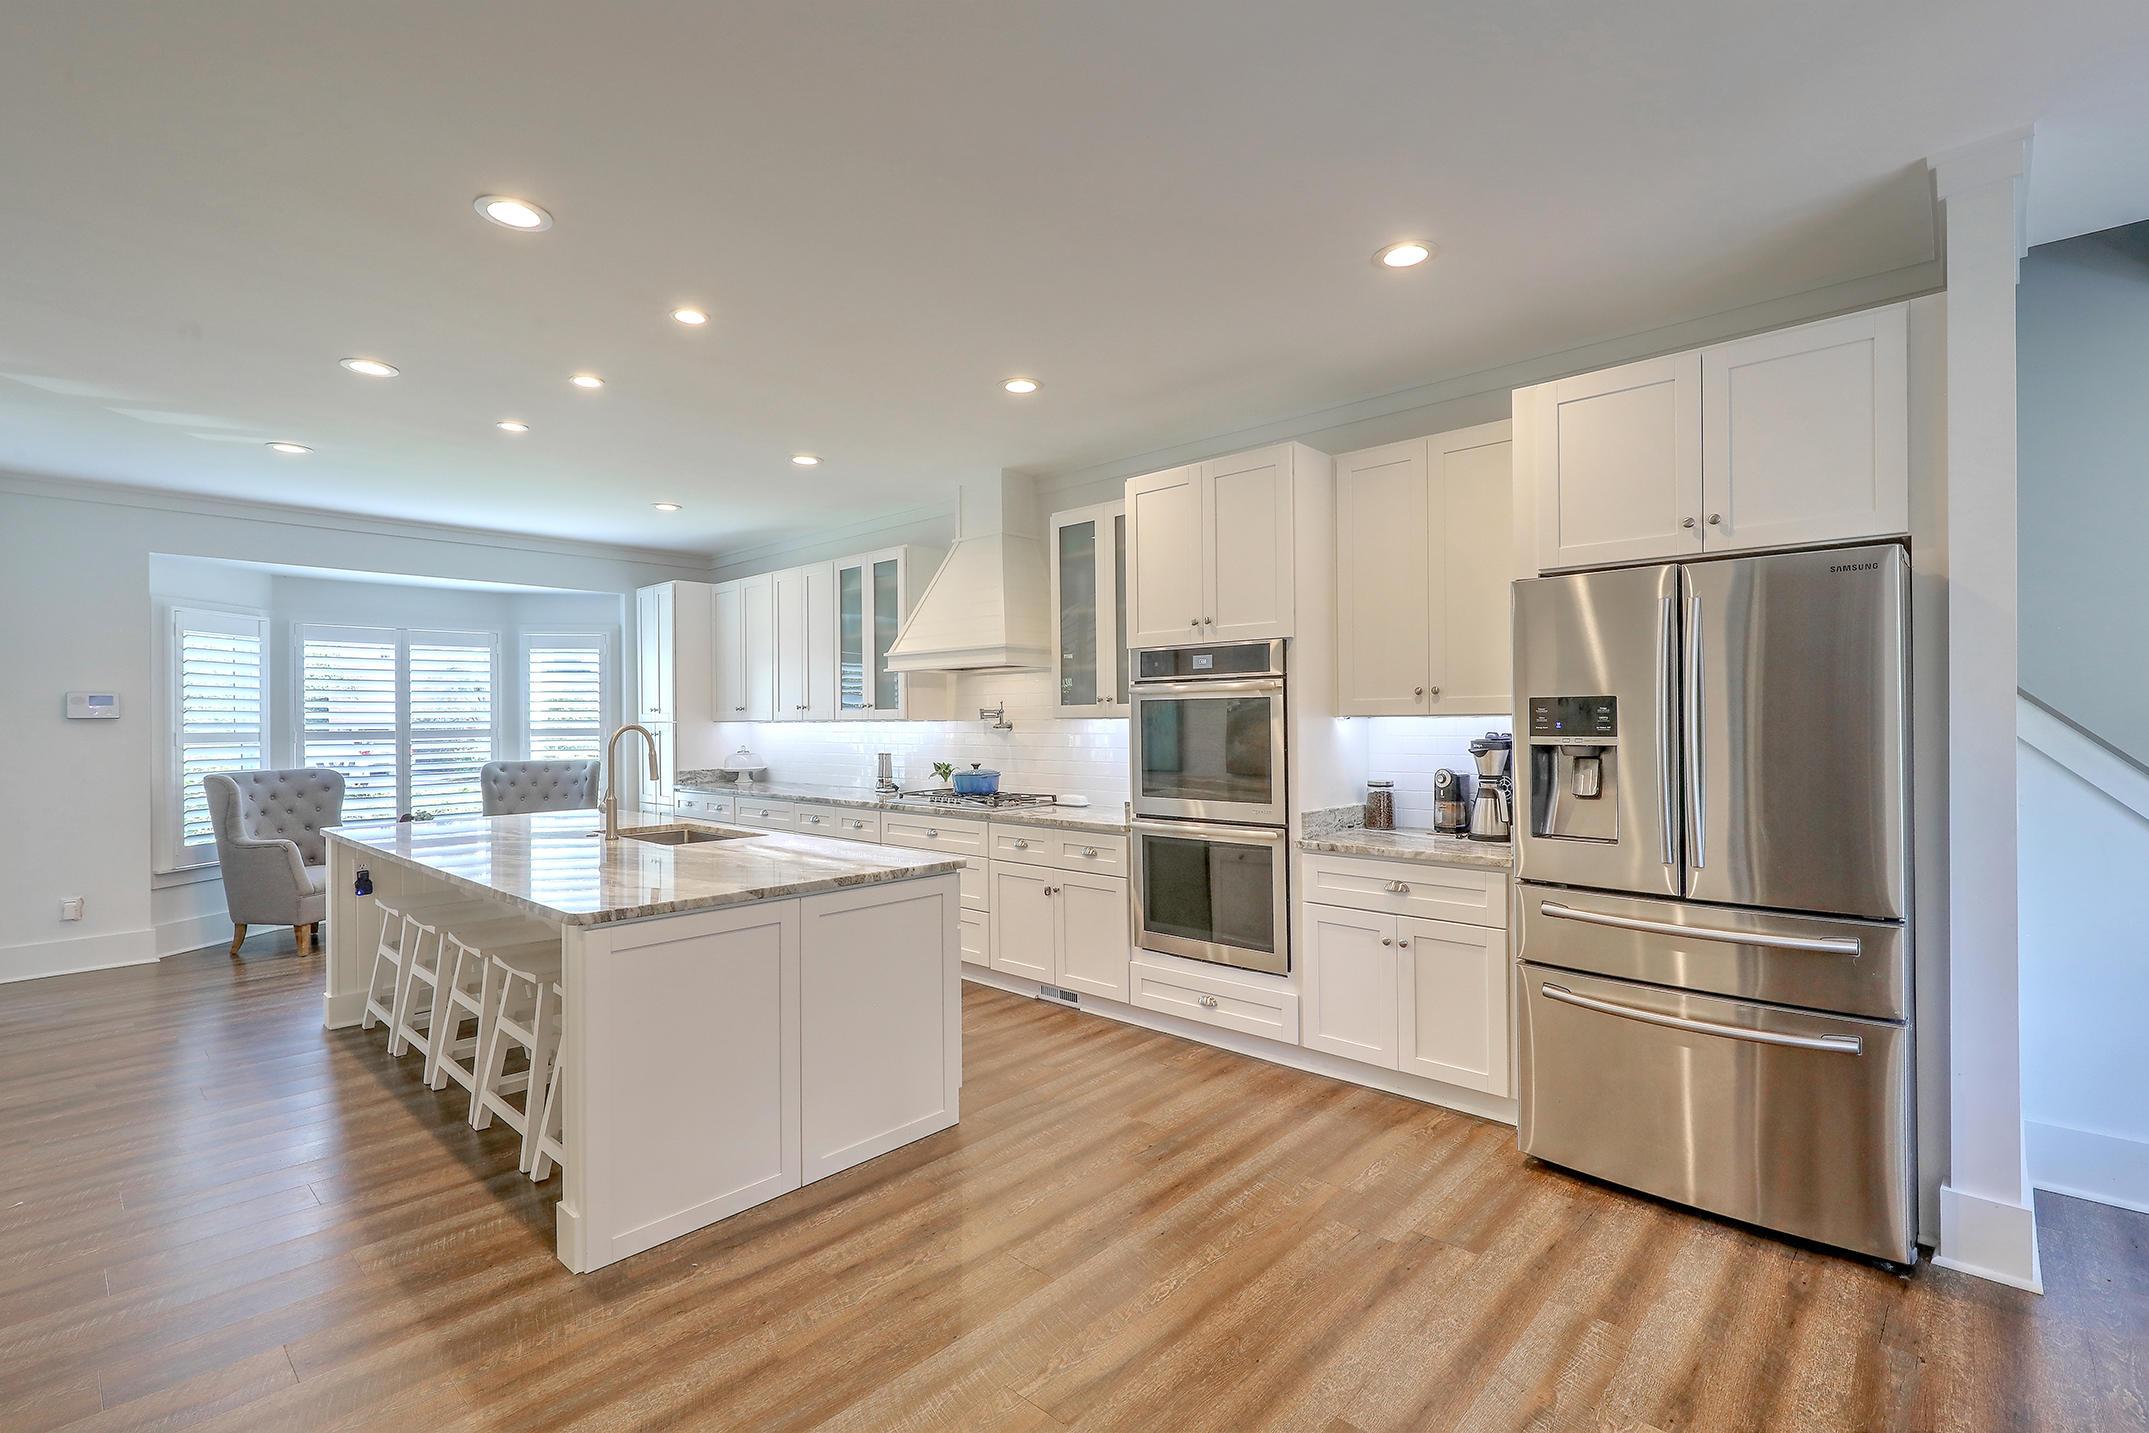 Hobcaw Creek Plantation Homes For Sale - 619 Palisades, Mount Pleasant, SC - 45